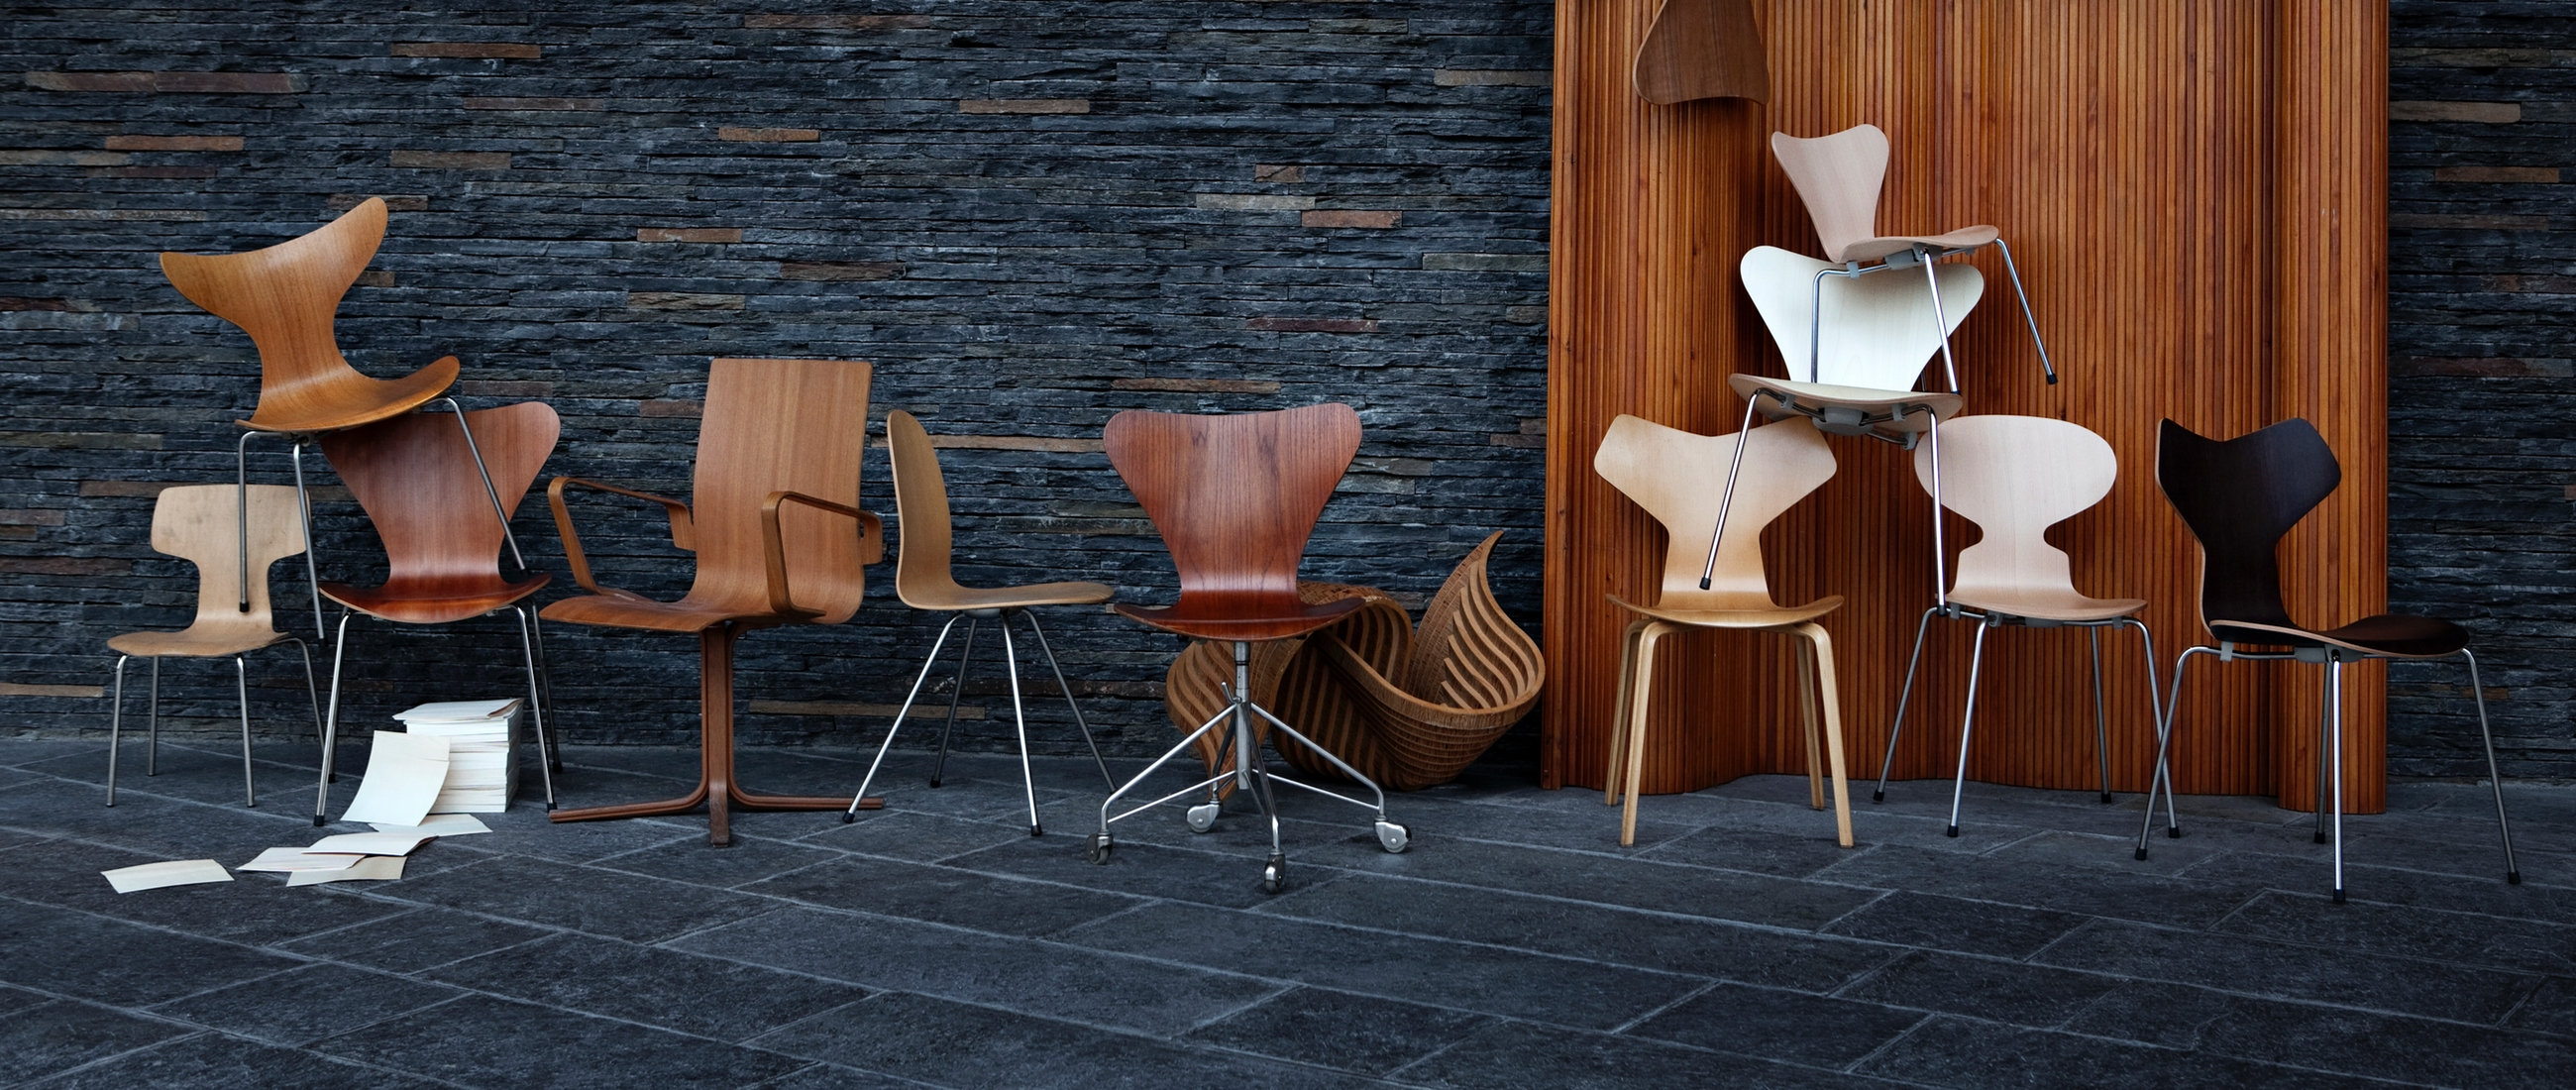 fritz hansen wohnidee. Black Bedroom Furniture Sets. Home Design Ideas